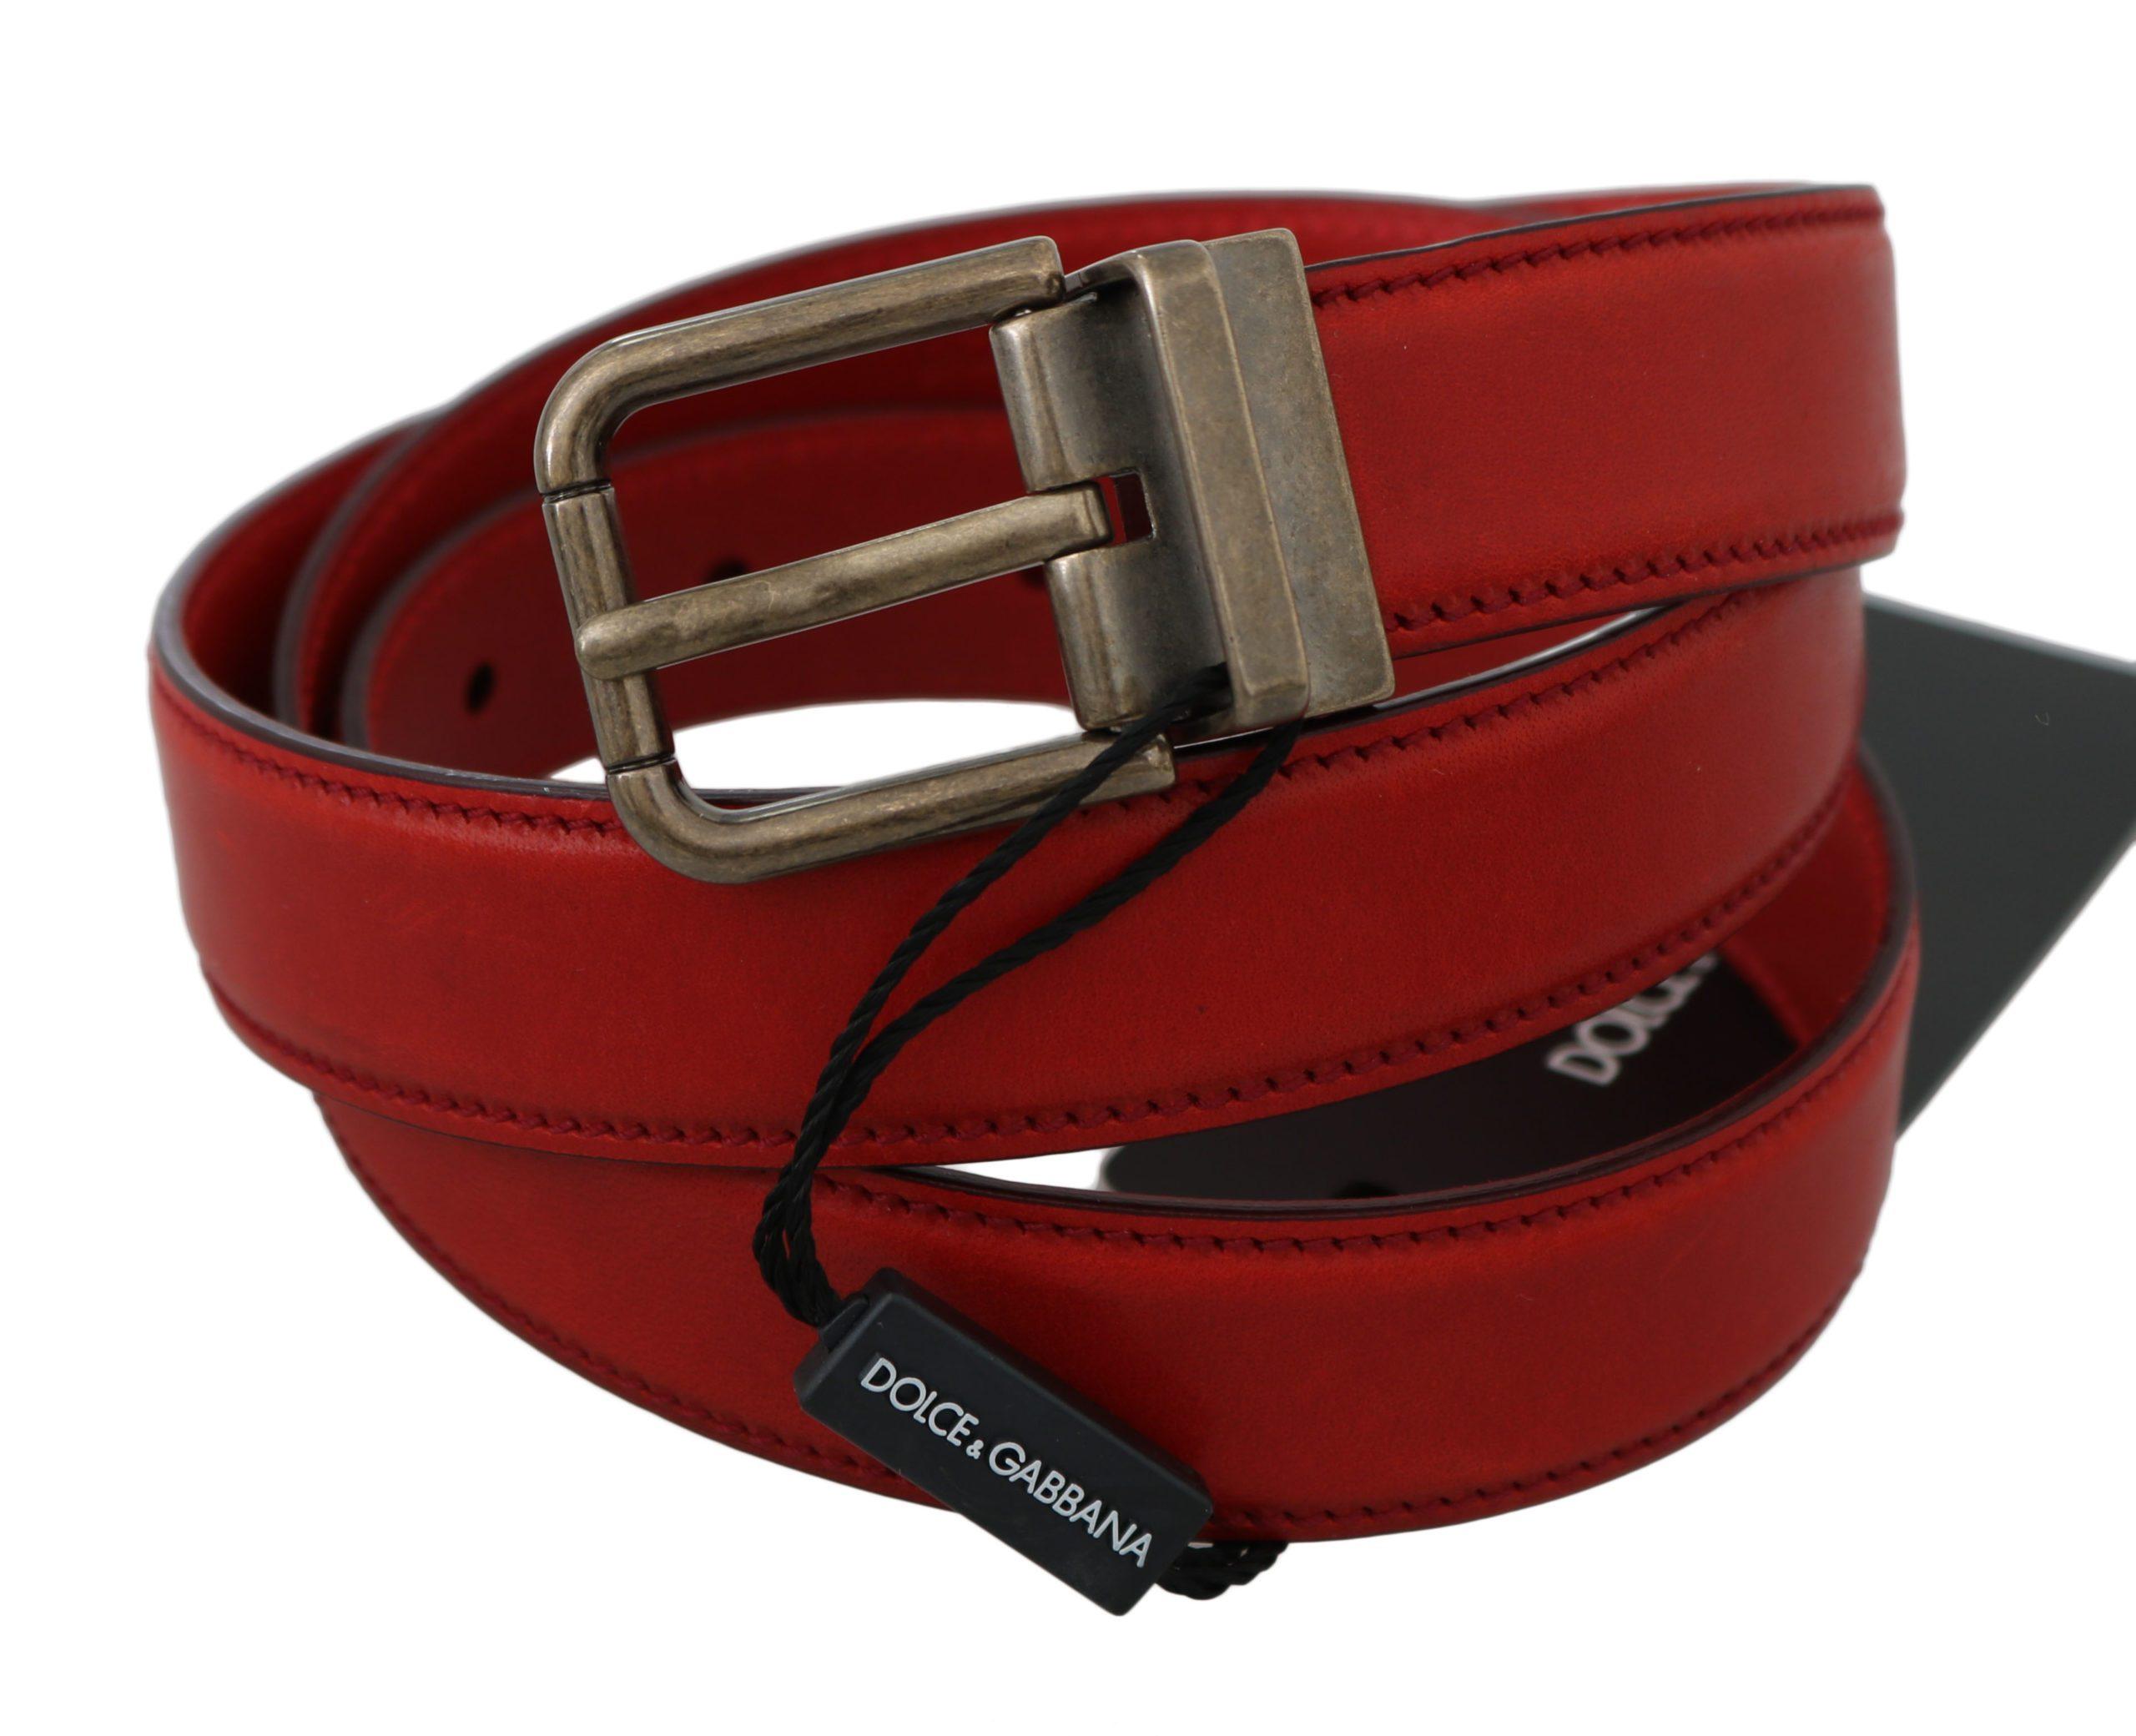 Dolce & Gabbana Men's Leather Metal Buckle Belt Red BEL60357 - 90 cm / 36 Inches